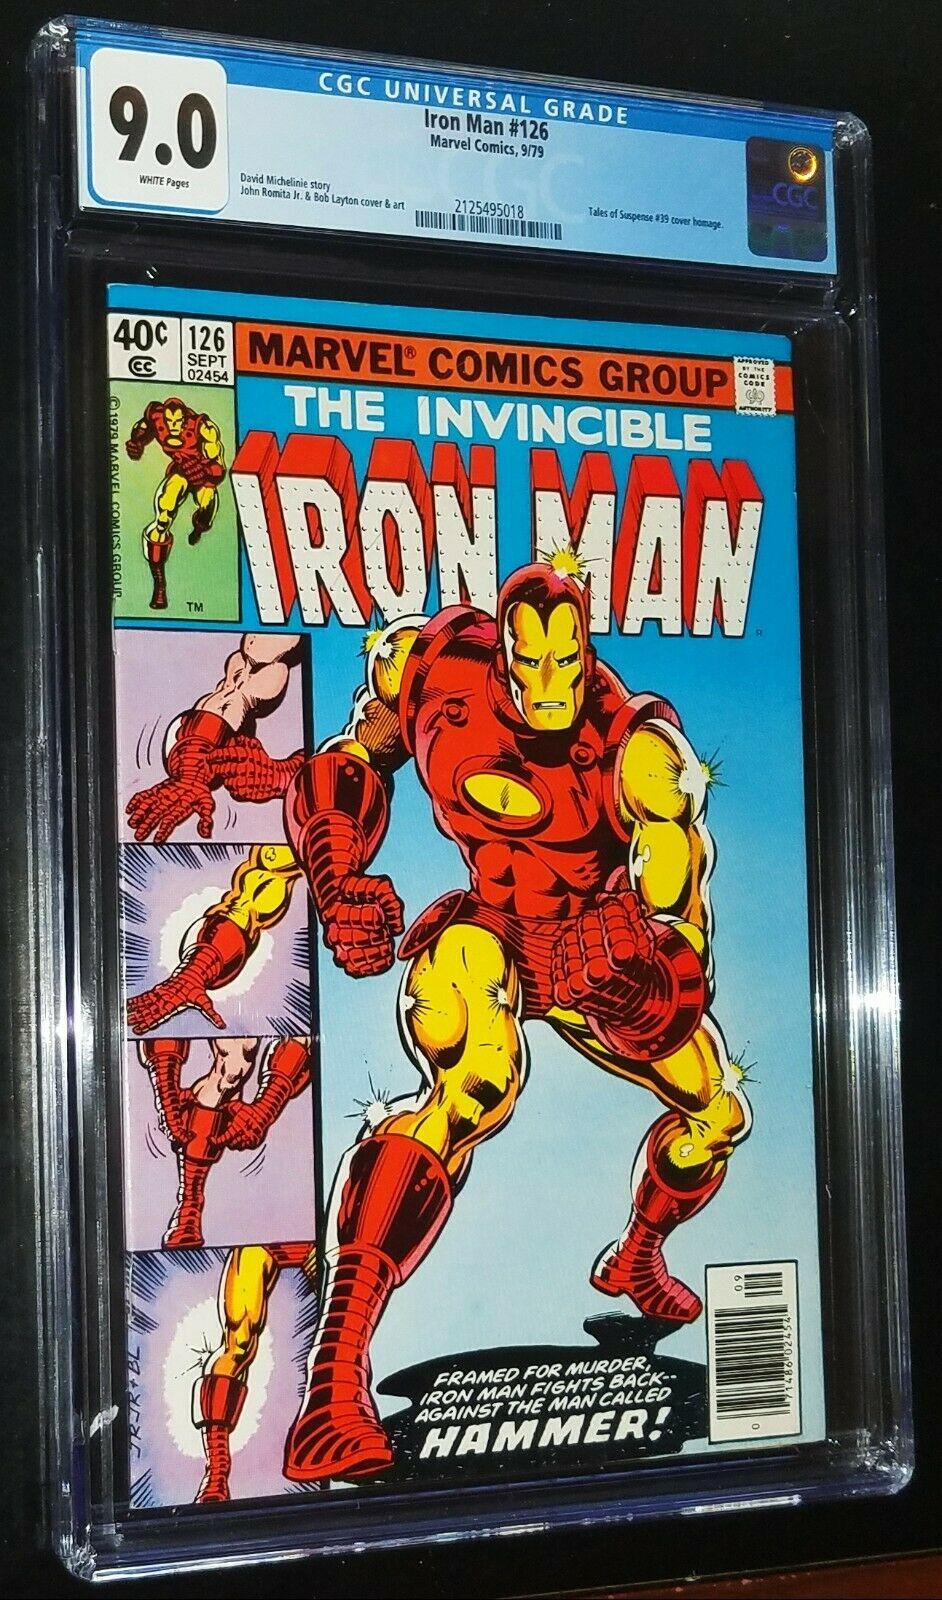 THE INVINCIBLE IRON MAN #126 1979 Marvel Comics CGC 9.0 VF/NM